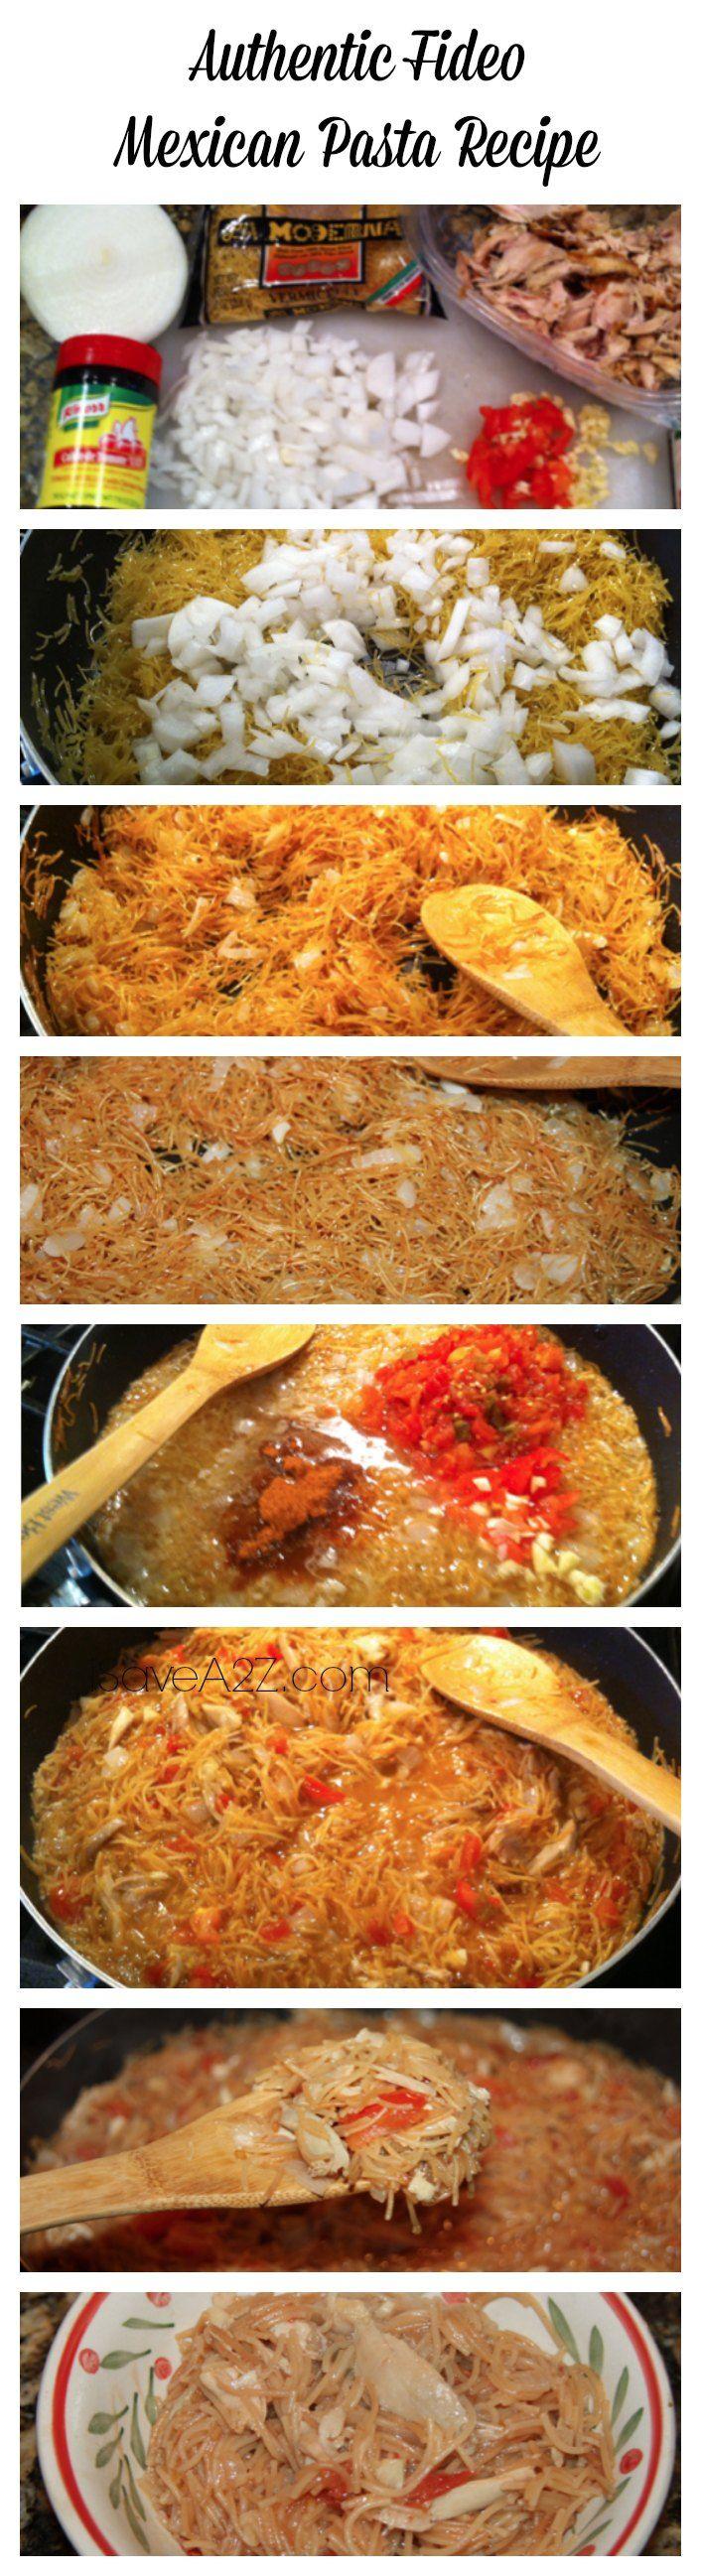 Authentic Fideo Mexican Pasta Recipe - iSaveA2Z.com  #PinOfTheDay